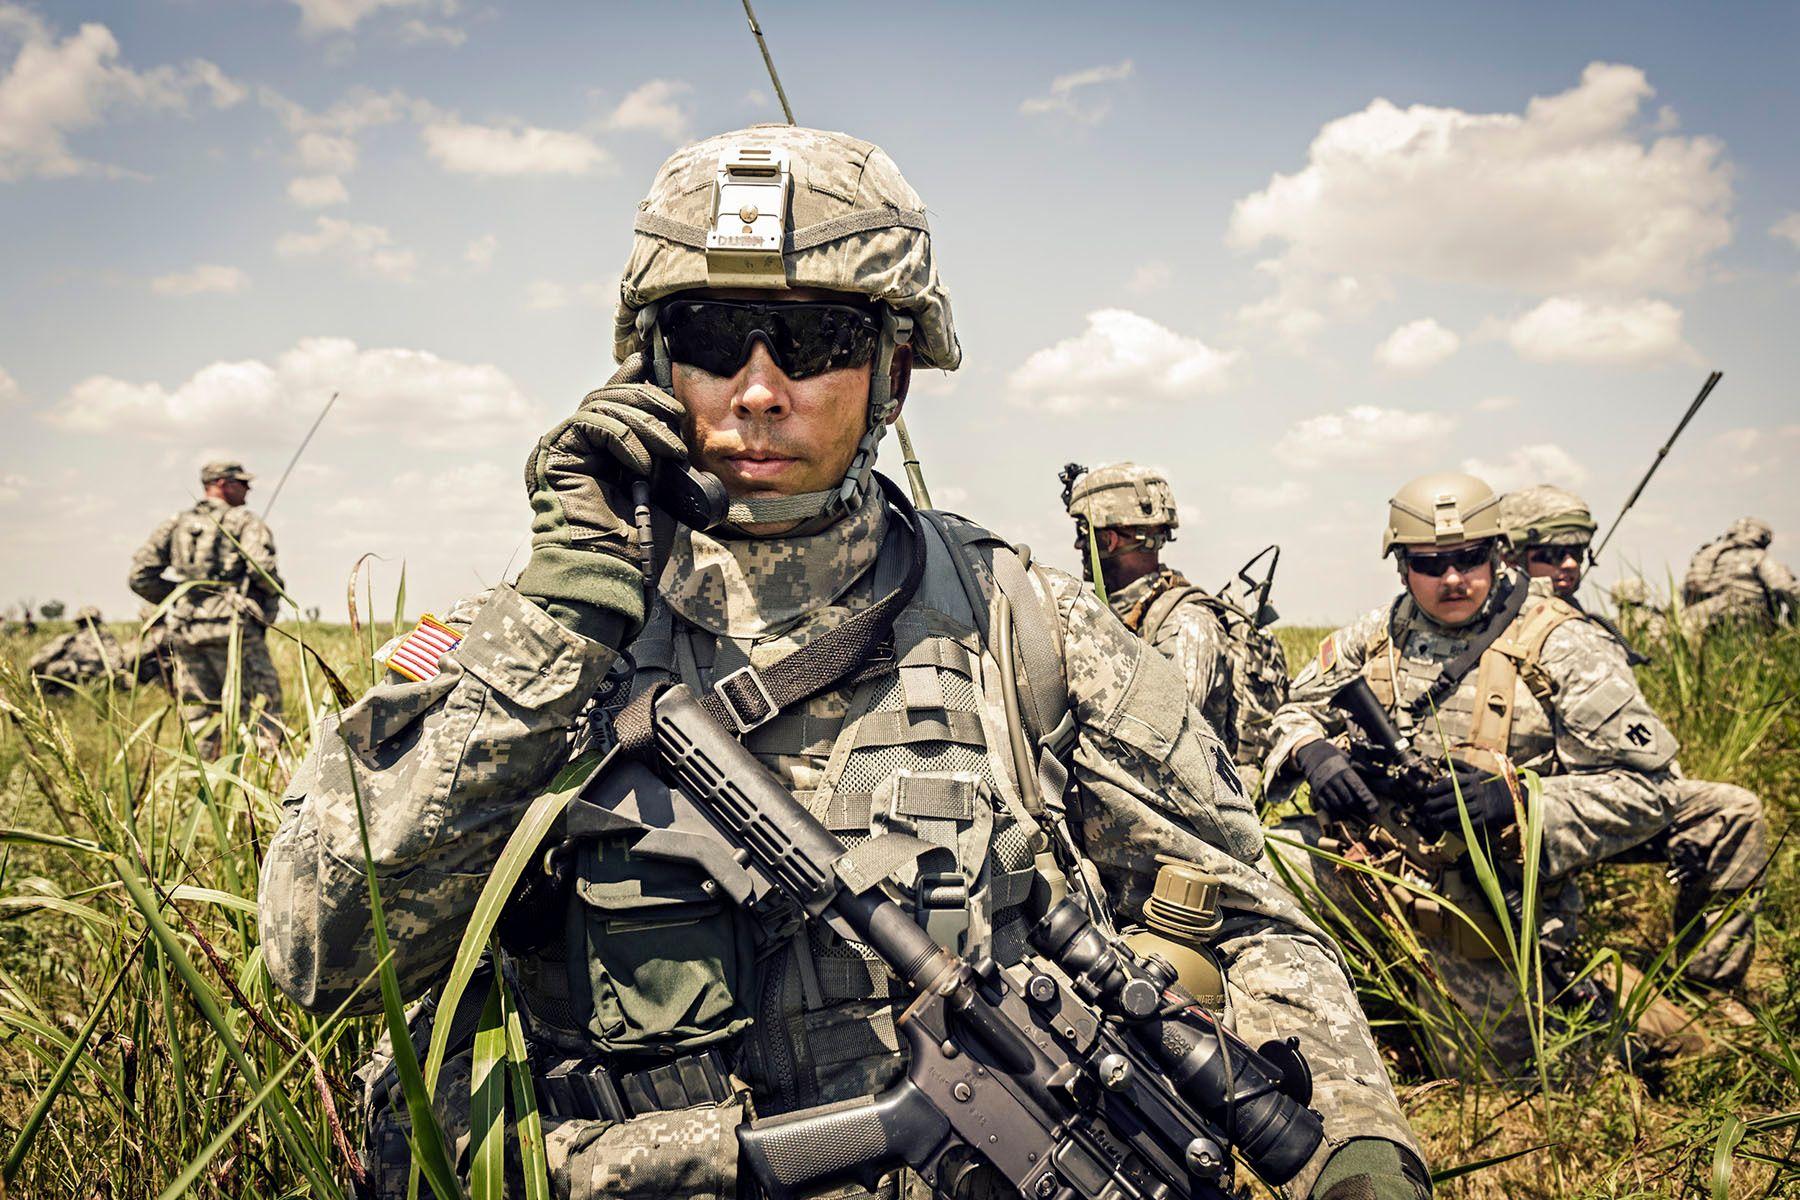 1nationalguard10.jpg